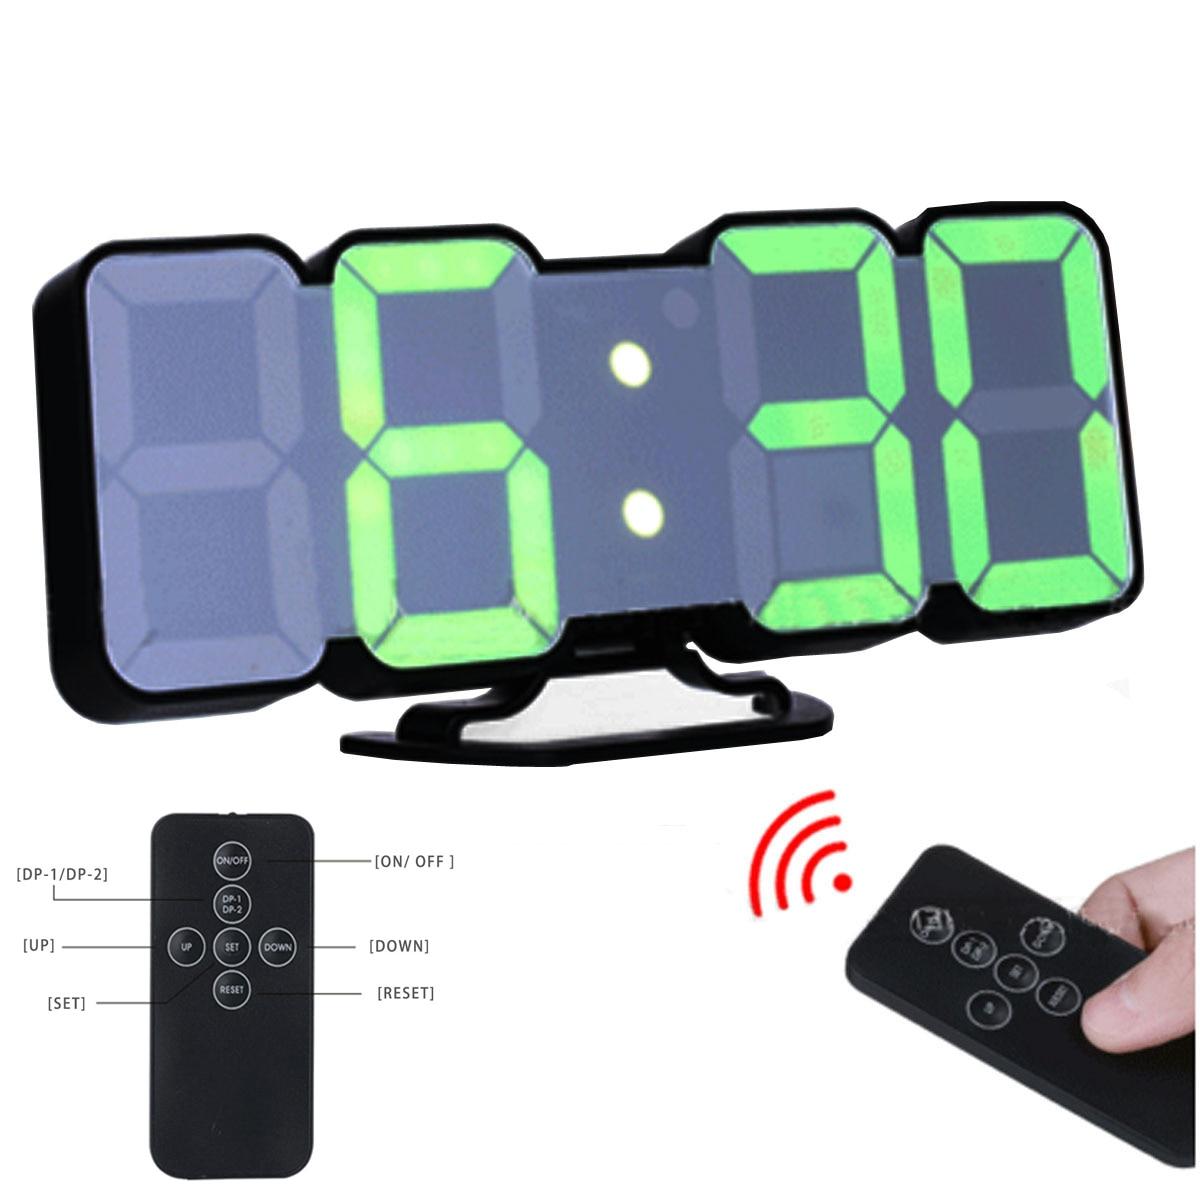 EAAGD 3D inalámbrico remoto Digital Reloj despertador de pared, 115 variaciones de Color de LED Digital, modo de Control de voz, controlador-in Relojes despertadores from Hogar y Mascotas    1